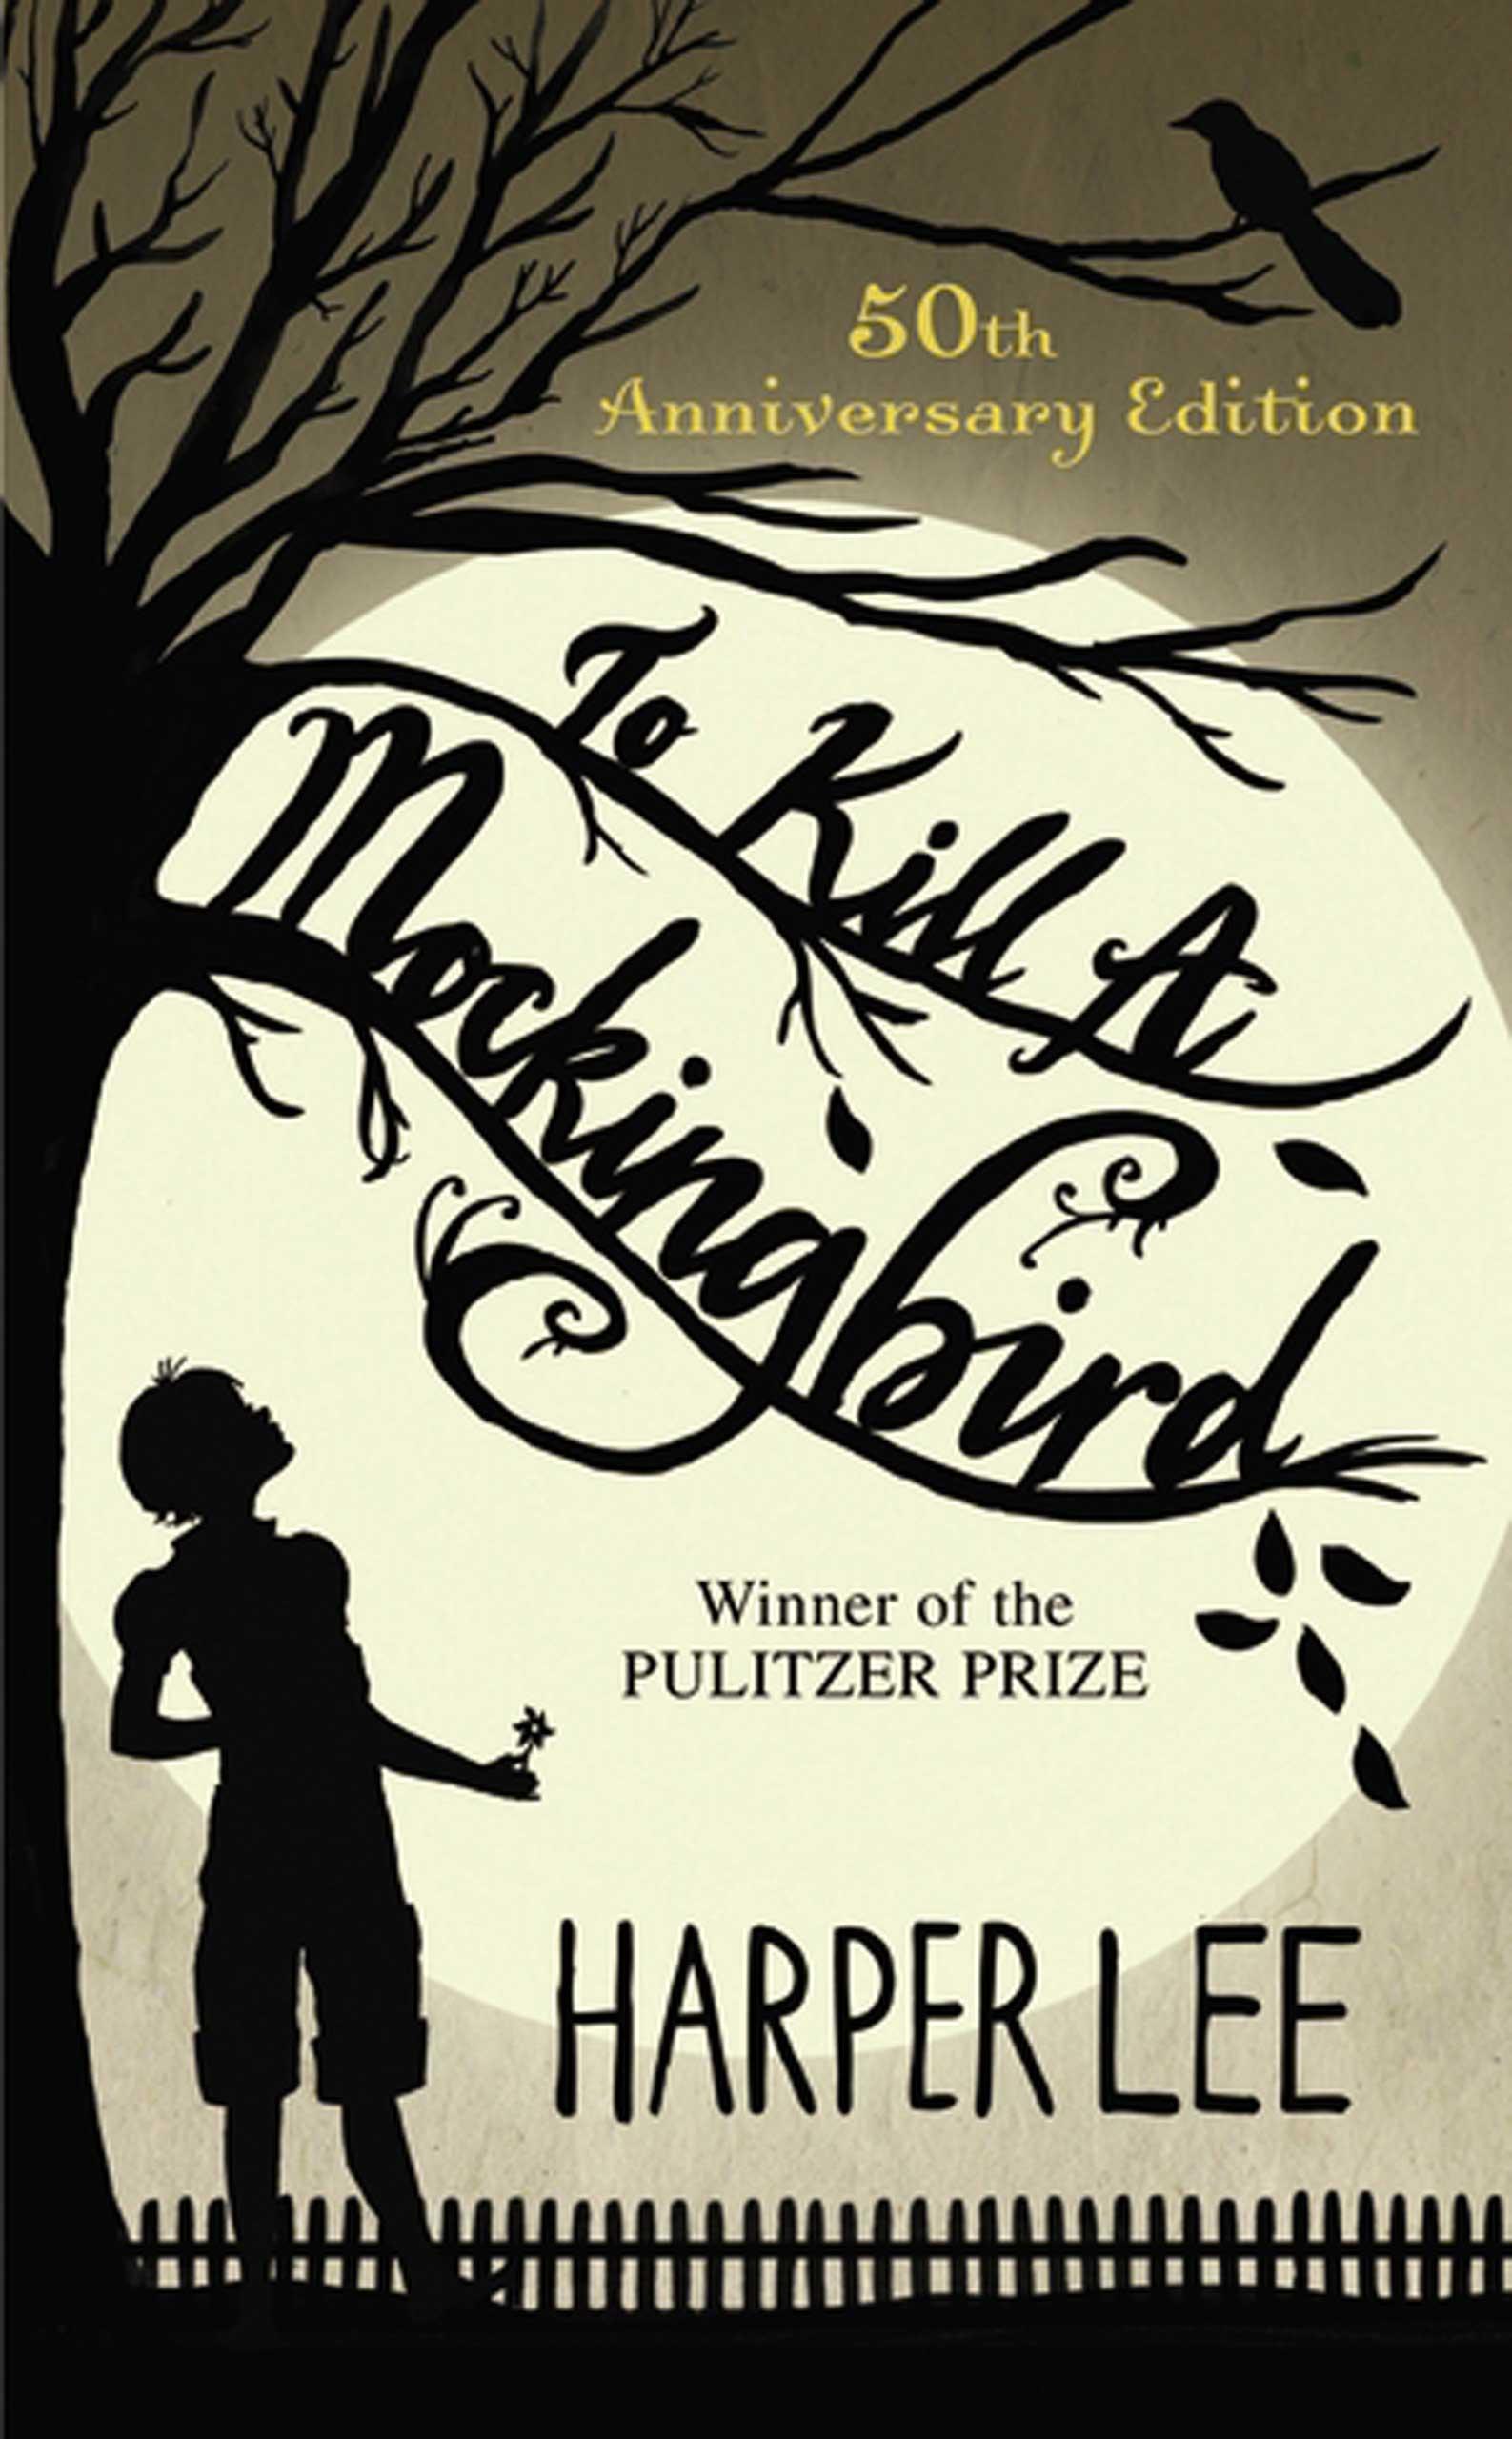 The classic novel To Kill a Mockingbird by Harper Lee.